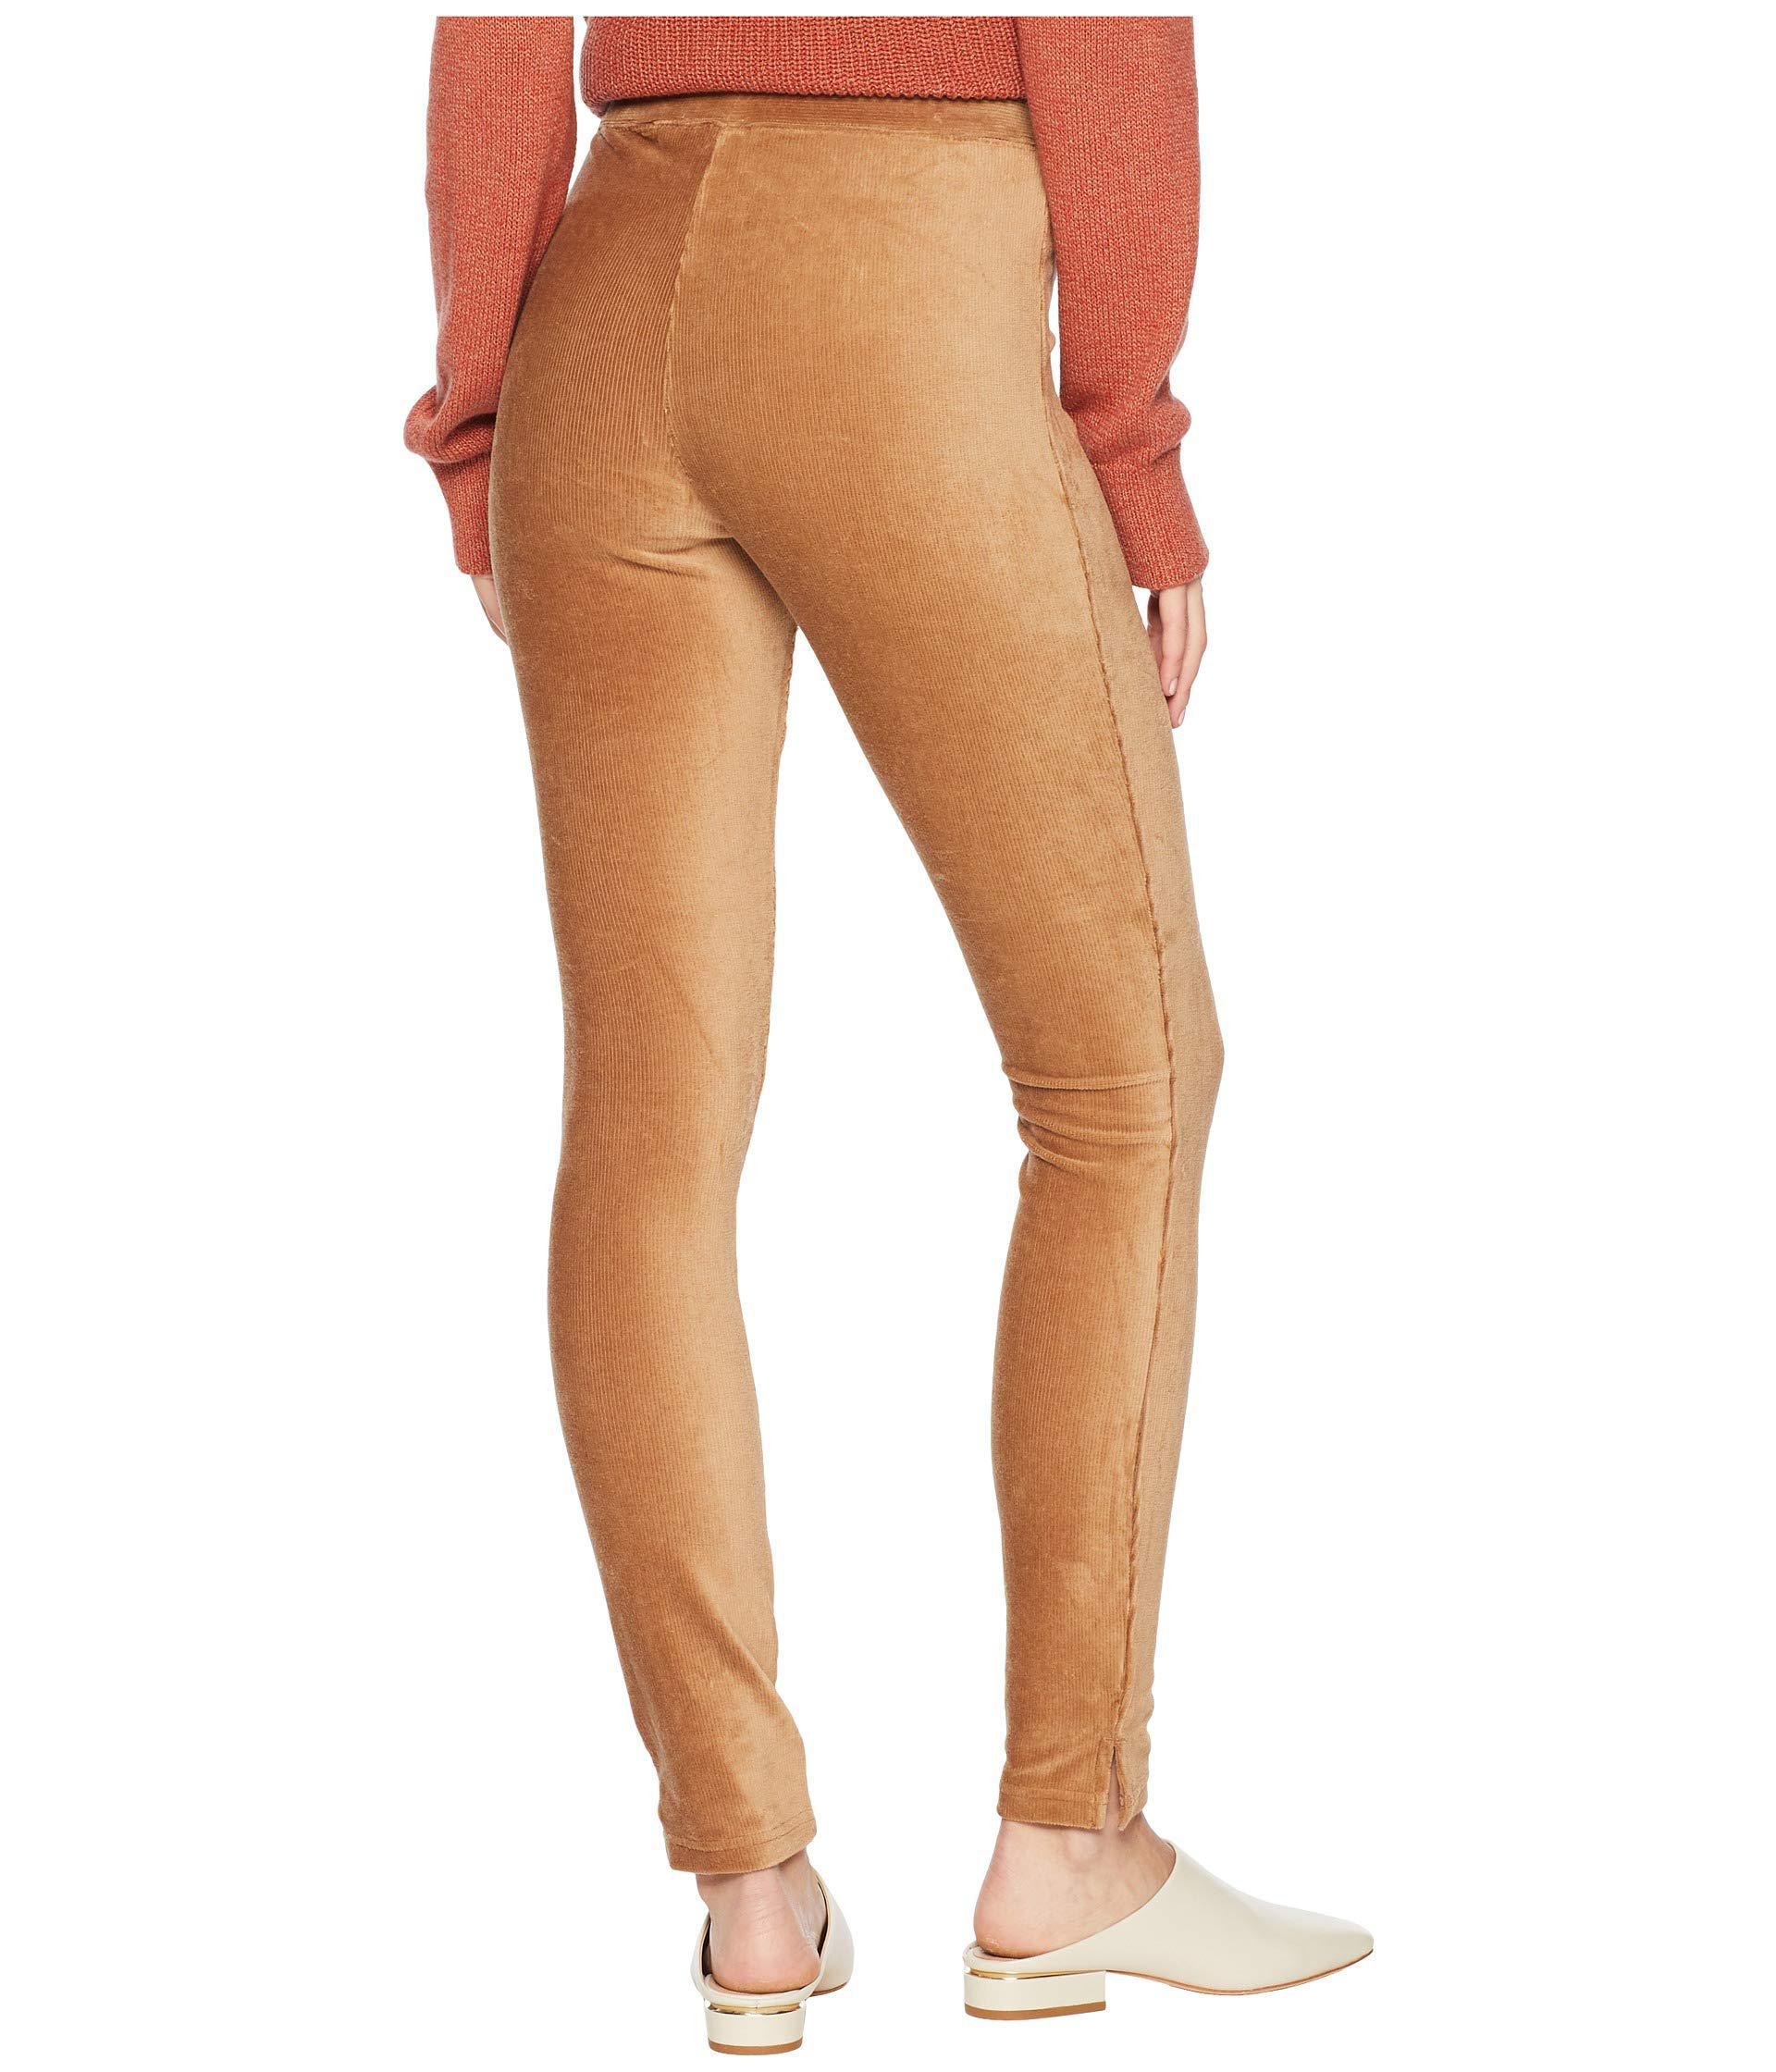 b903f5faf60acc Hue - Multicolor Plus Size High-waist Corduroy Leggings (caramel) Women's  Casual Pants. View fullscreen